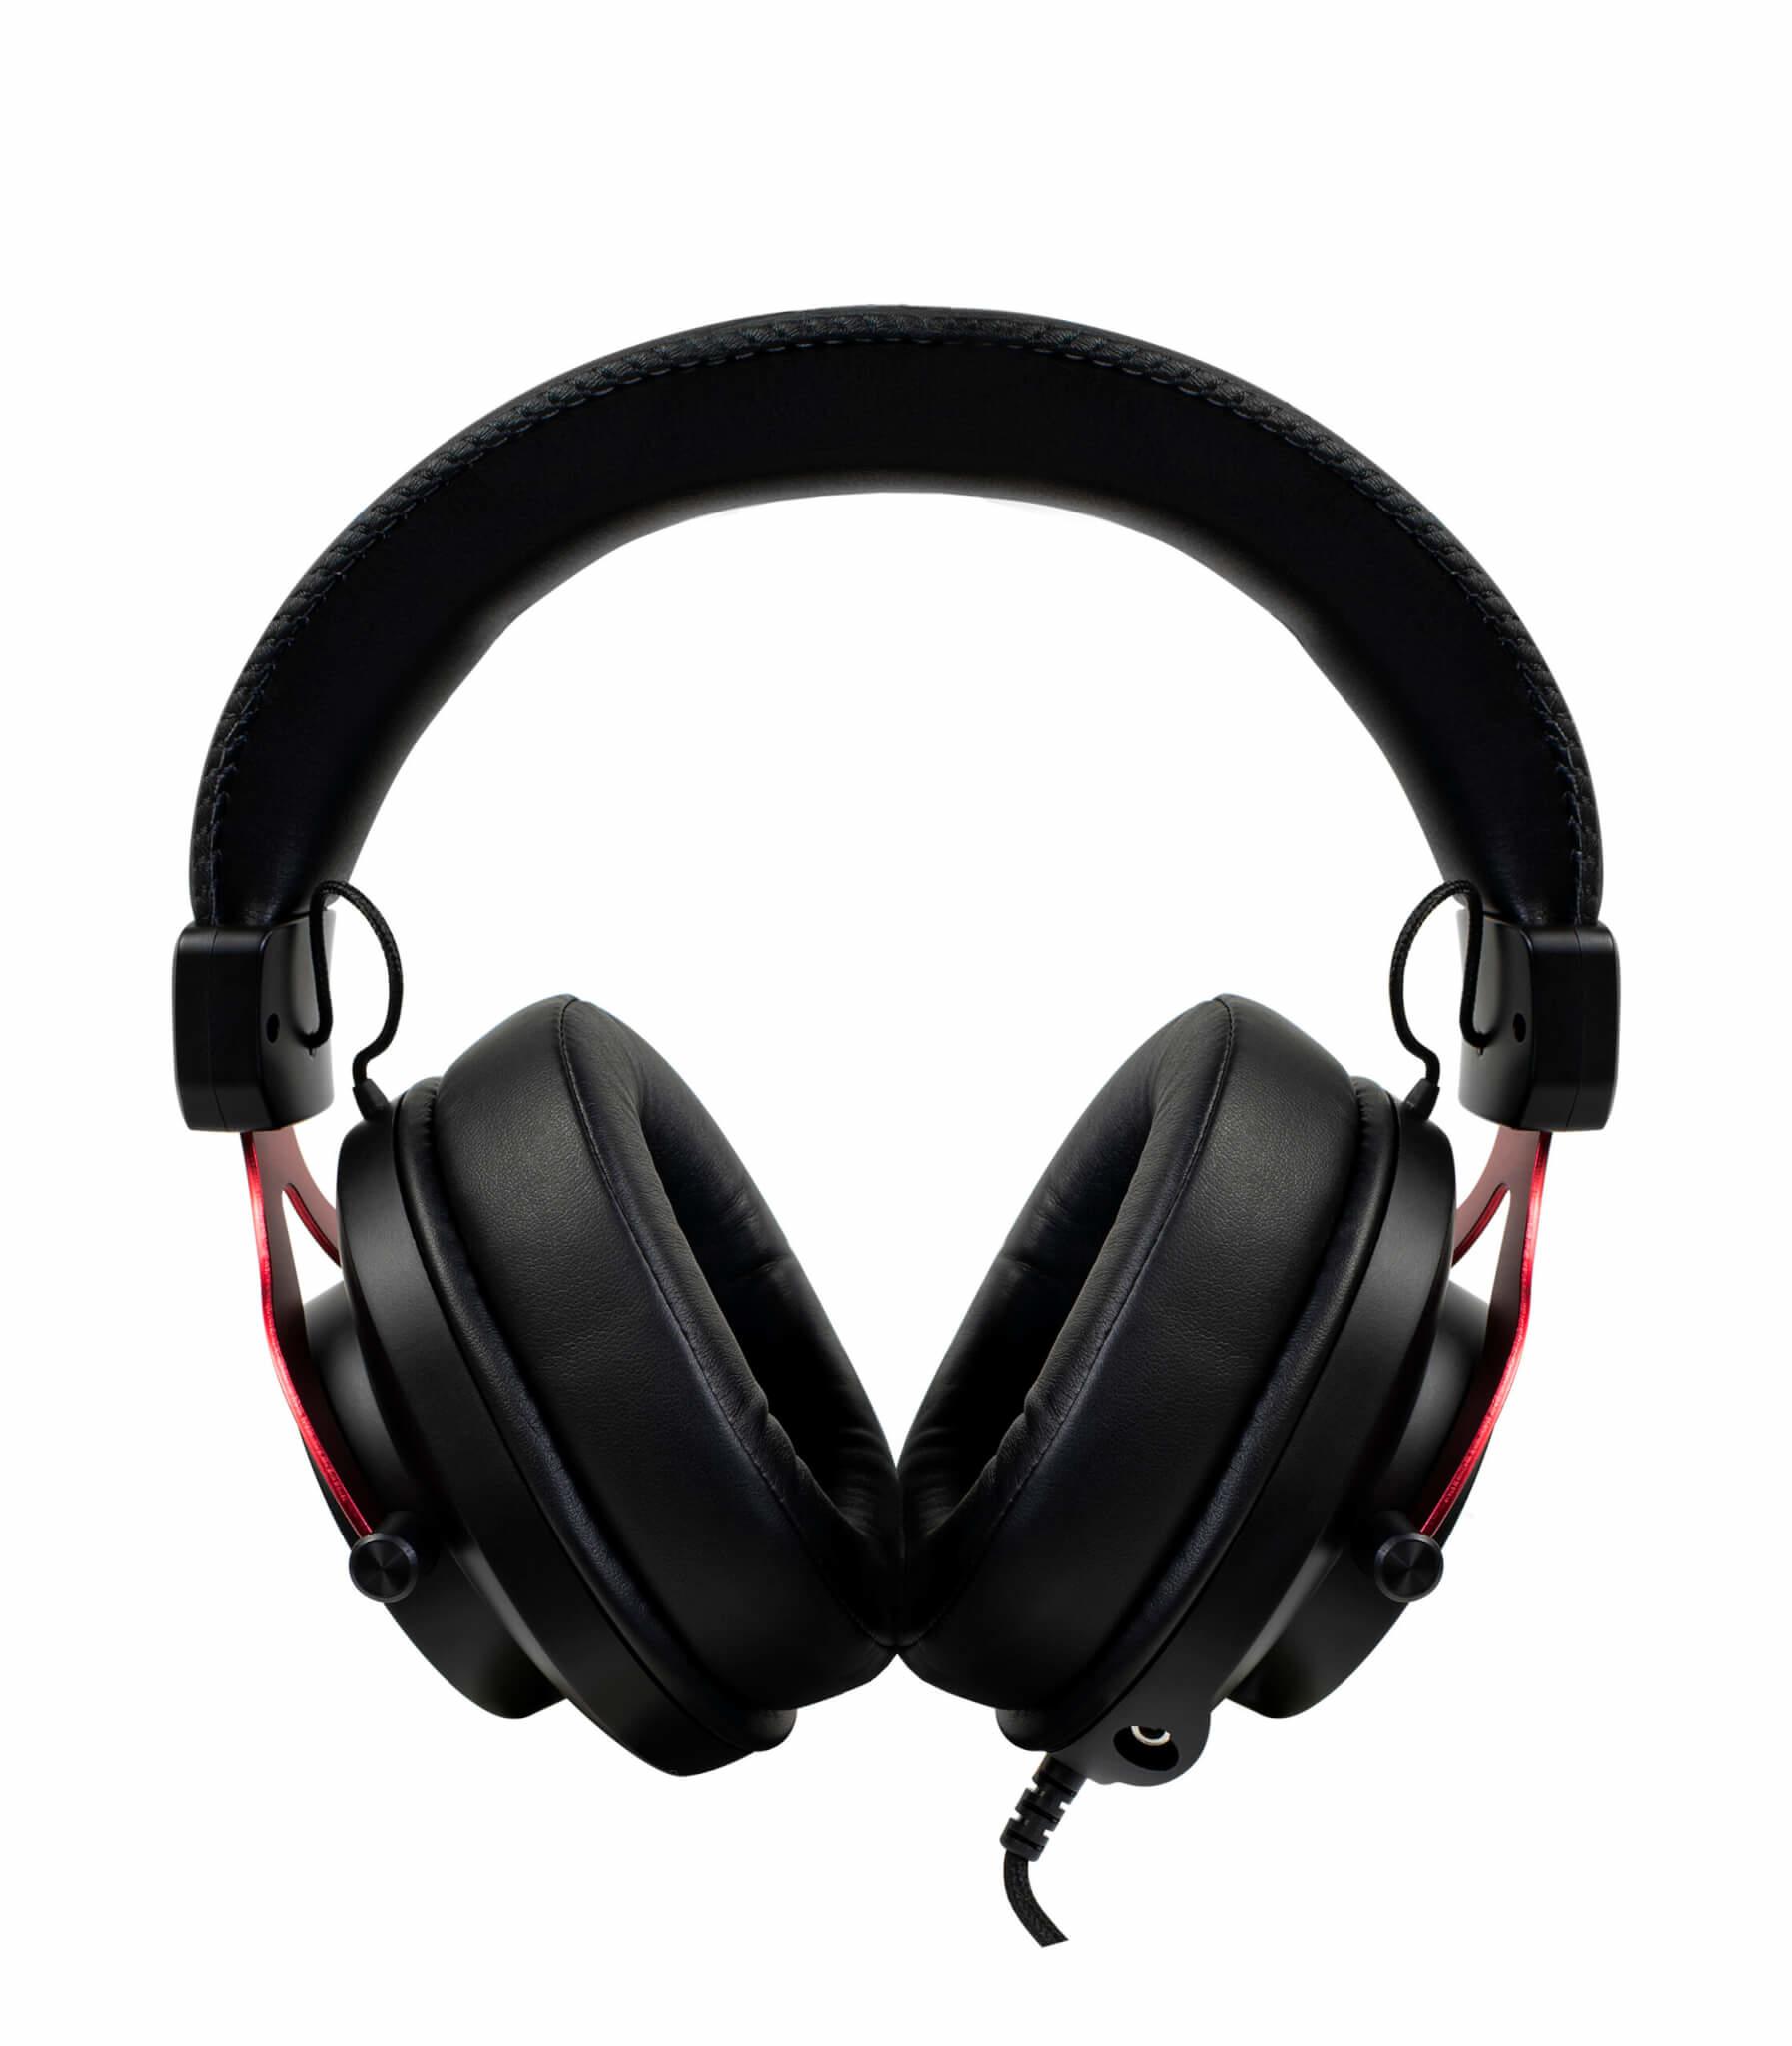 Arozzi Aria - Kopfhörer - Kopfband - Gaming - Schwarz - Rot - Binaural - Drehregler